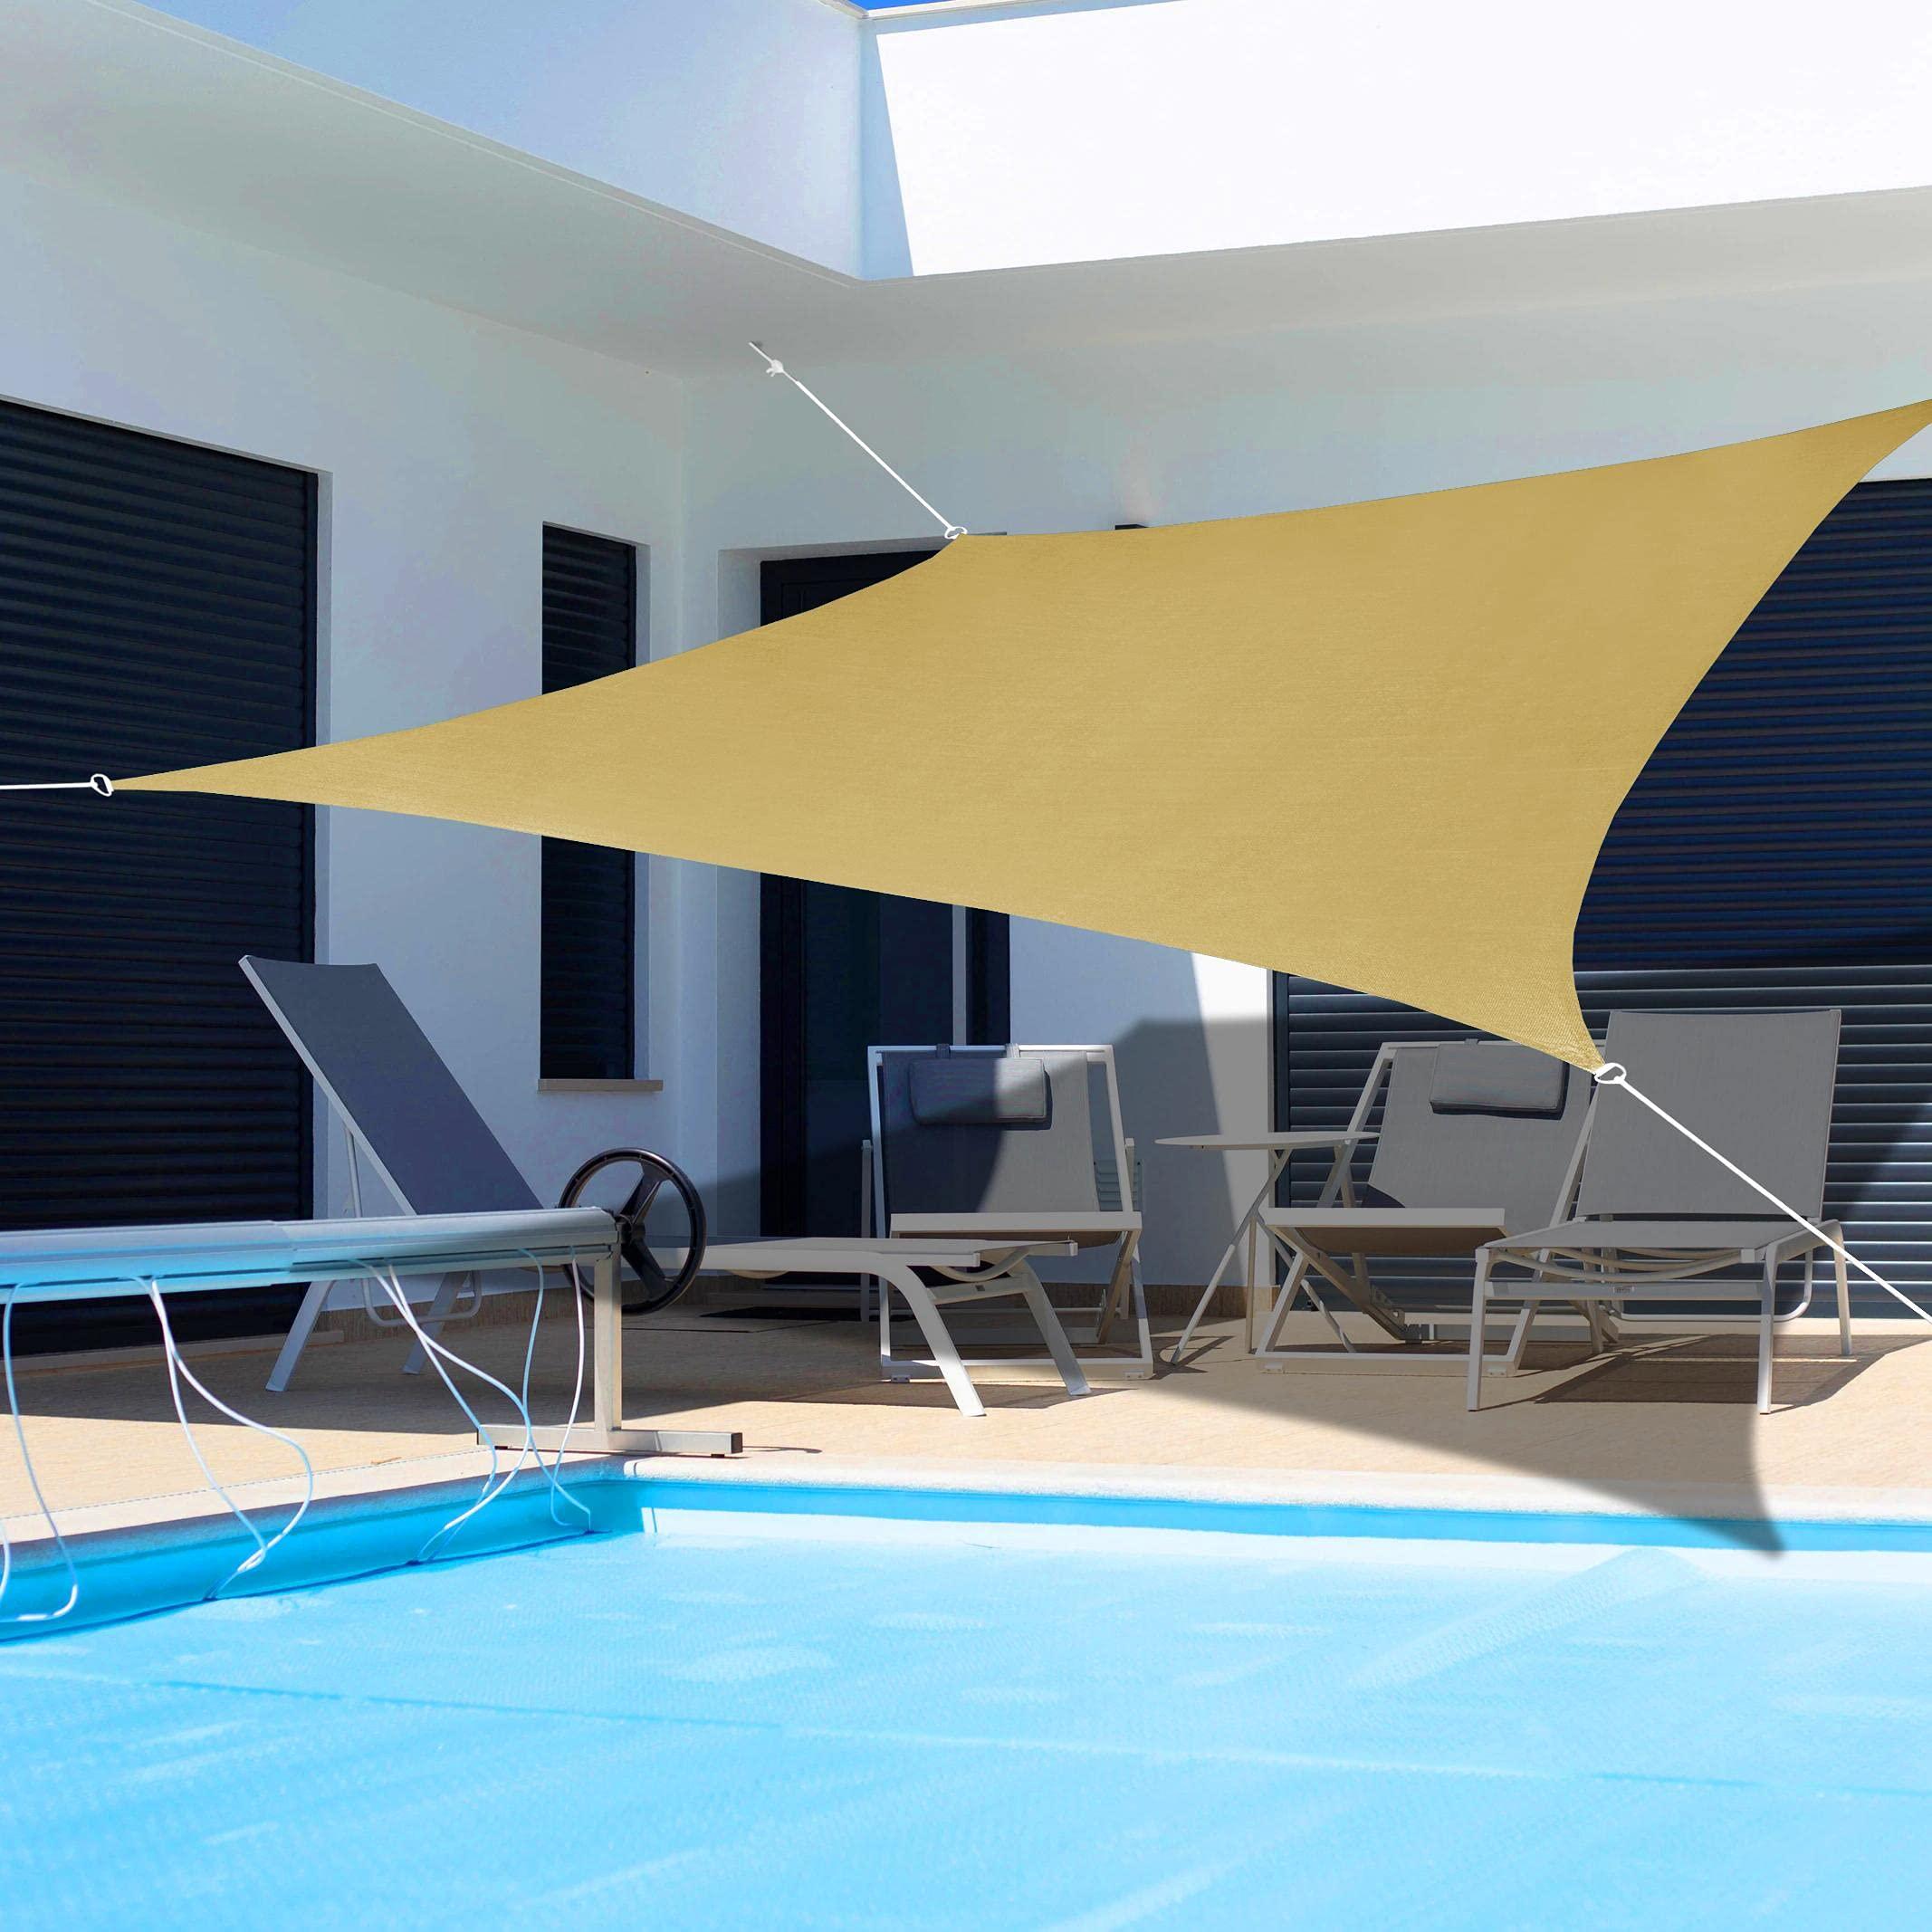 KYNNICETT Rectangle Sun Shade Sail Sunshades Canopy Outdoor Shades Cover for Patio Garden Backyard 12' x 16' Sand